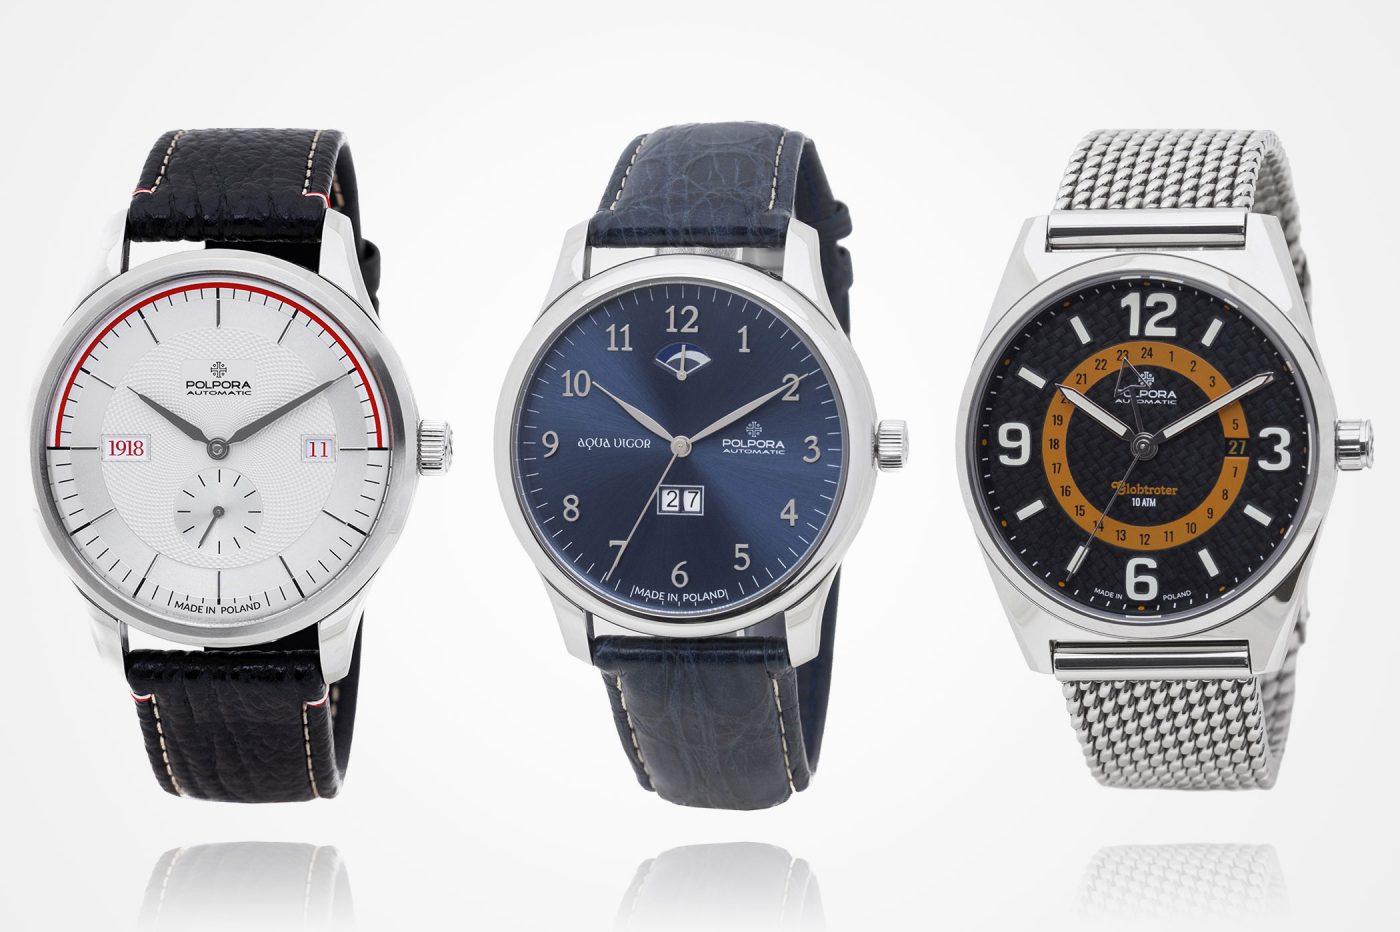 Polpora – premiera zegarków 1918, Aqua Vigor i Globtroter [cena]